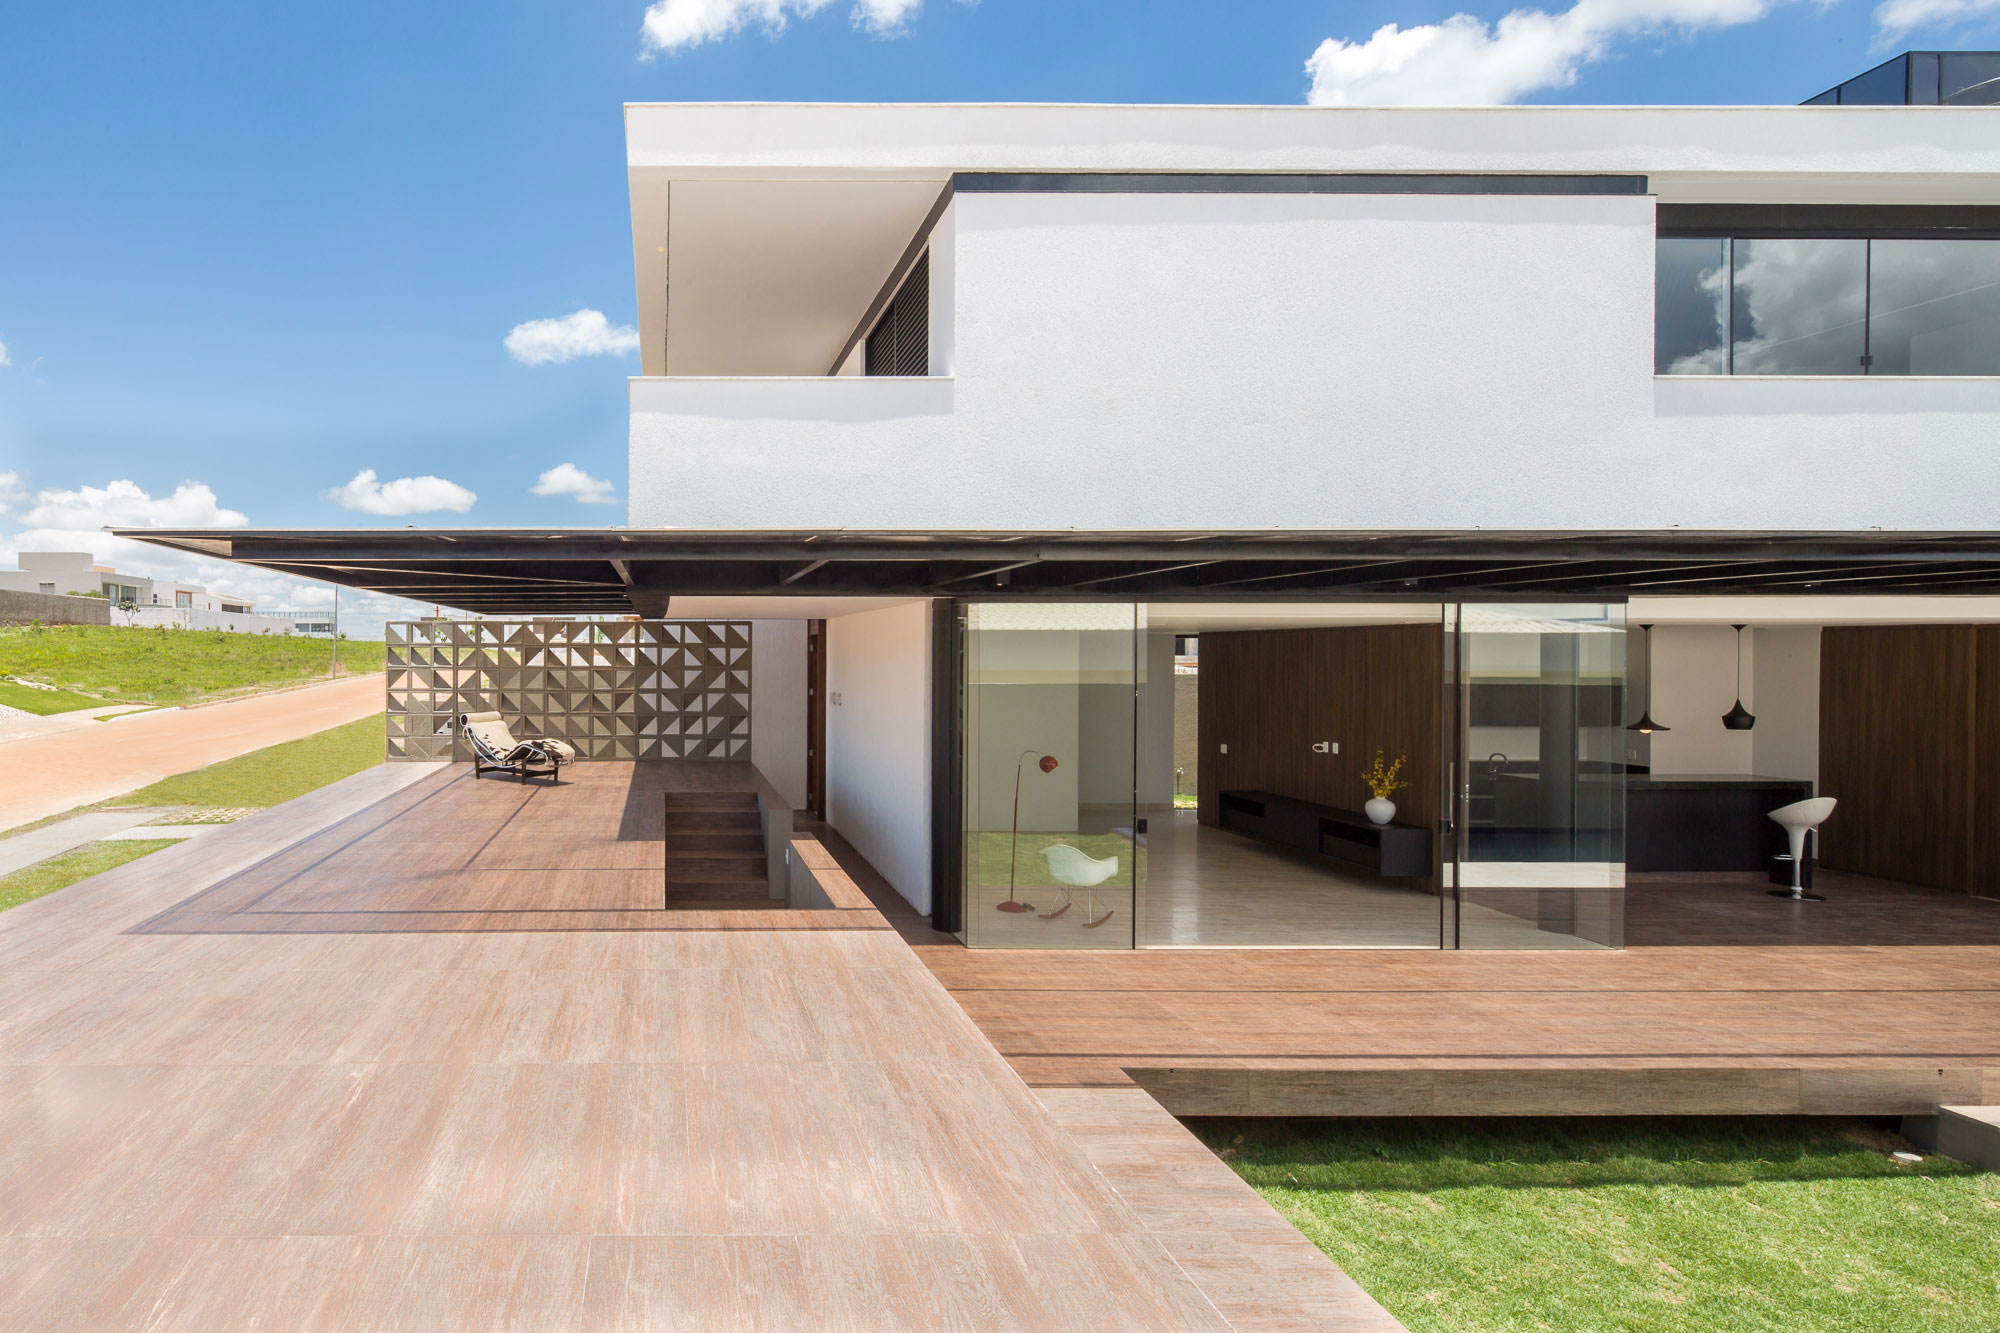 Casa MCO by Esquadra|Yi-04